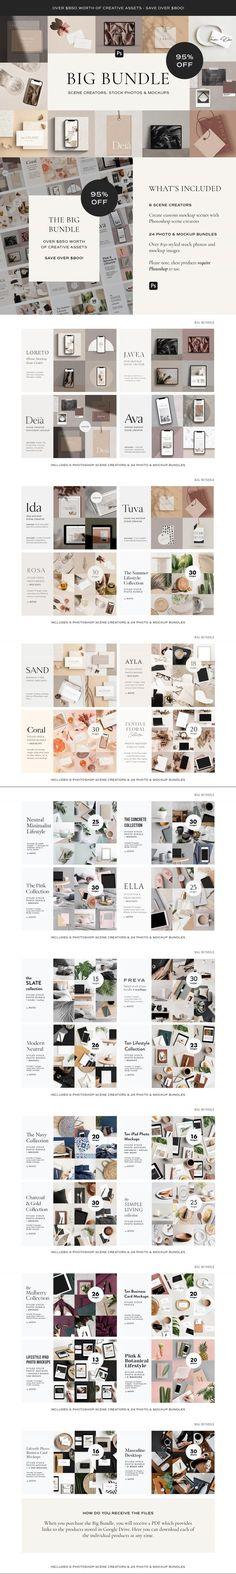 BIG Bundle: 95% OFF Photos & Mockups #scenecreator #TemplateDesign #seamlesspattern #pin #cookie #mockupbundle #seamlesspaper #bar #photoshop #templates #mockups #moodboard #mockup #tagmockup #pantone #contemporary #bags #pattern #modern Mockup Creator, Phone Mockup, Fruit In Season, Business Card Mock Up, Scene Creator, Mockup Templates, Web Design, Photoshop, Things To Sell